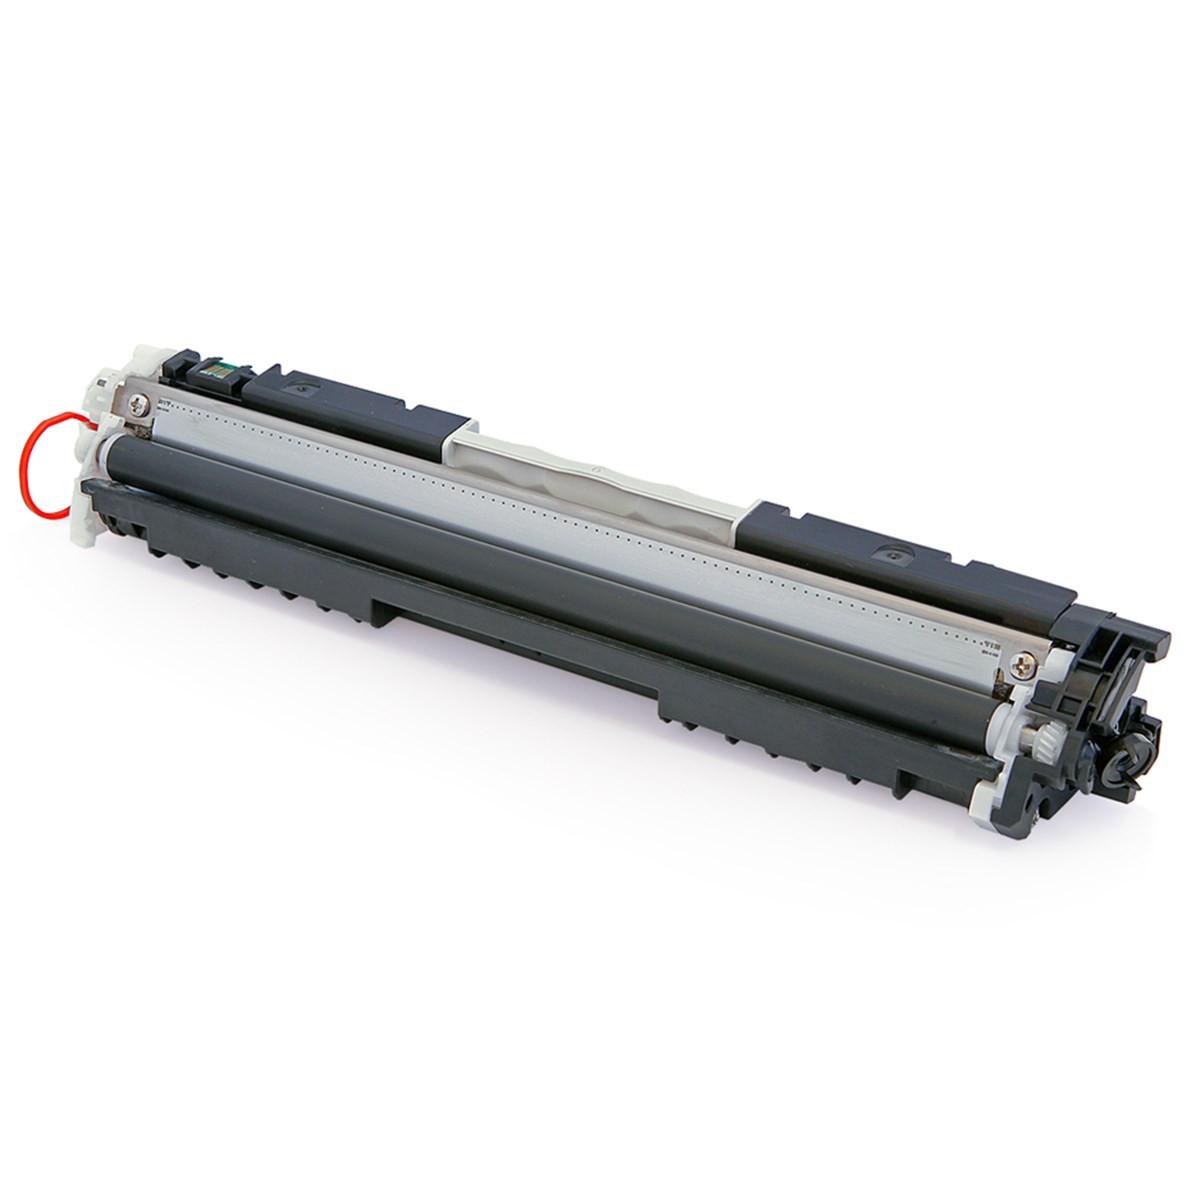 Toner Compatível HP CE310A Universal 310A 126A Preto | CP1020 CP1020WN CP1025 M175A | Premium 1.2k